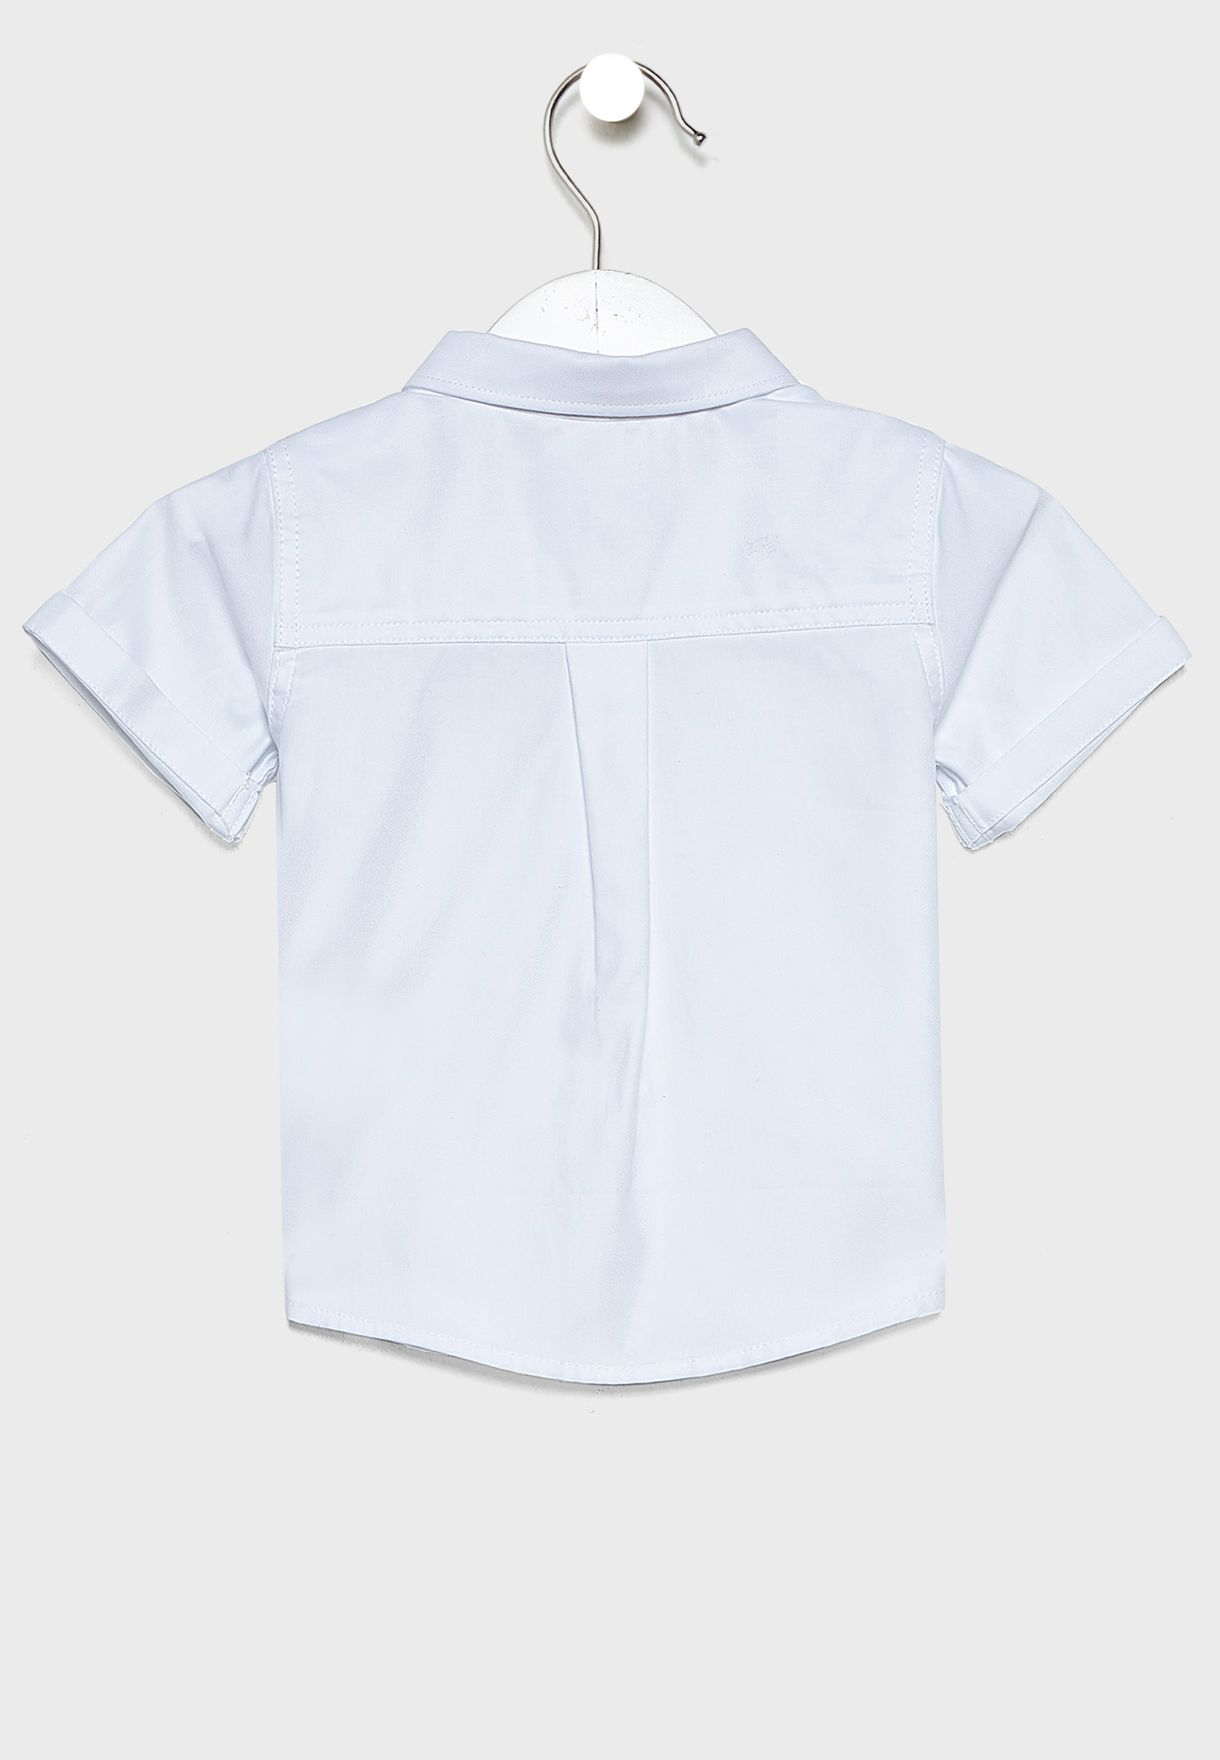 Infant Twill Shirt